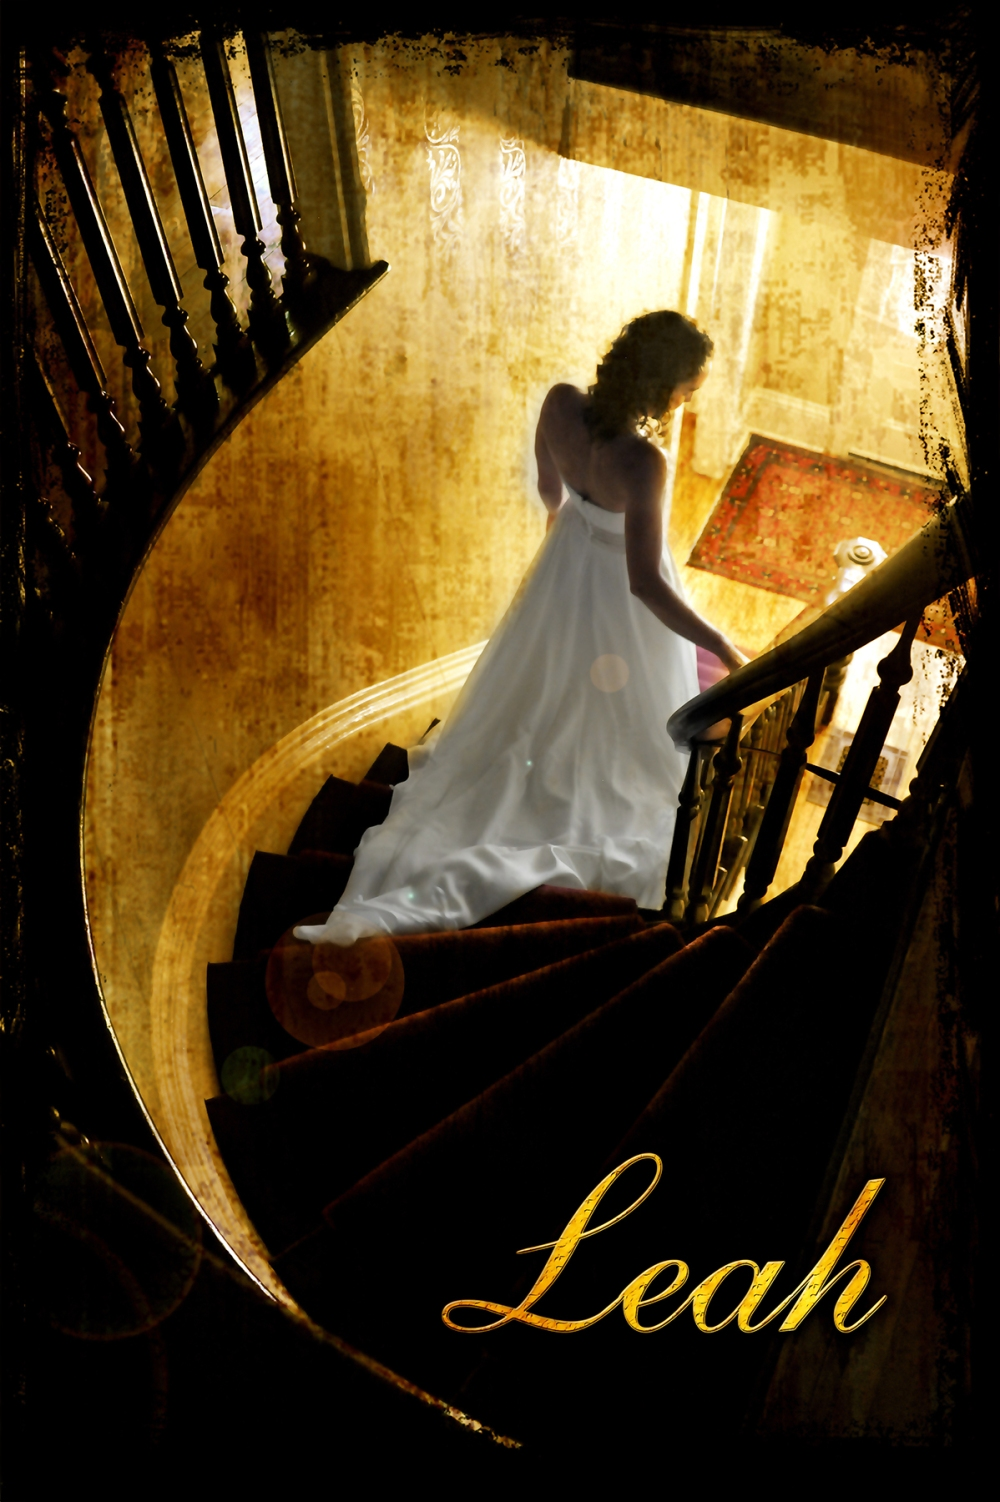 DSC_2405_Leah_Stairs_GA_flat_Smart_Blur_BB